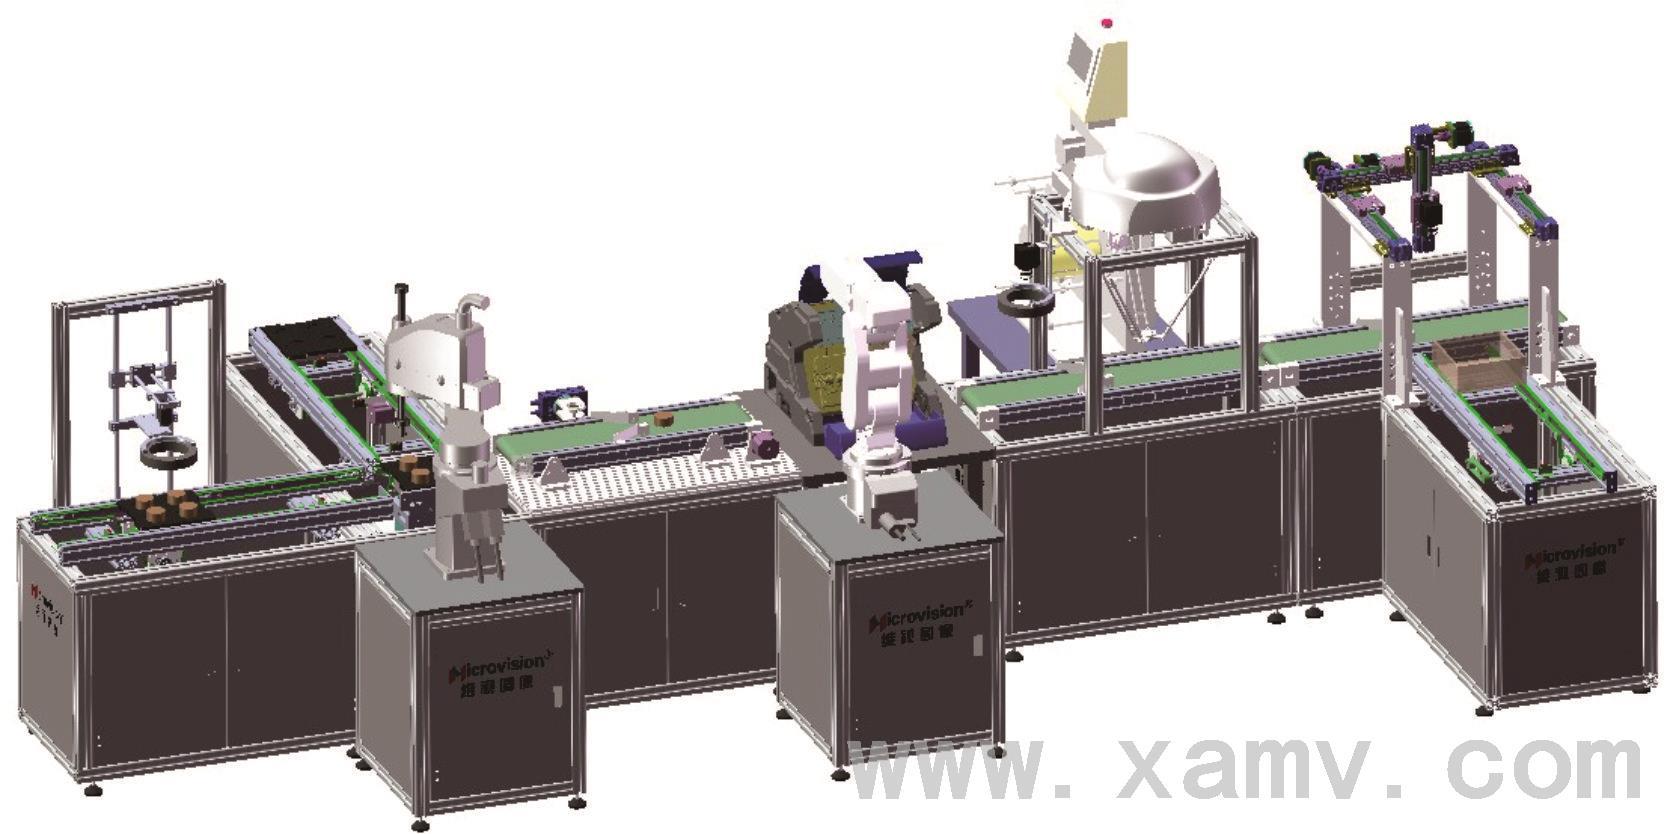 gvrmps群视觉机器人工业柔性自动化生产线